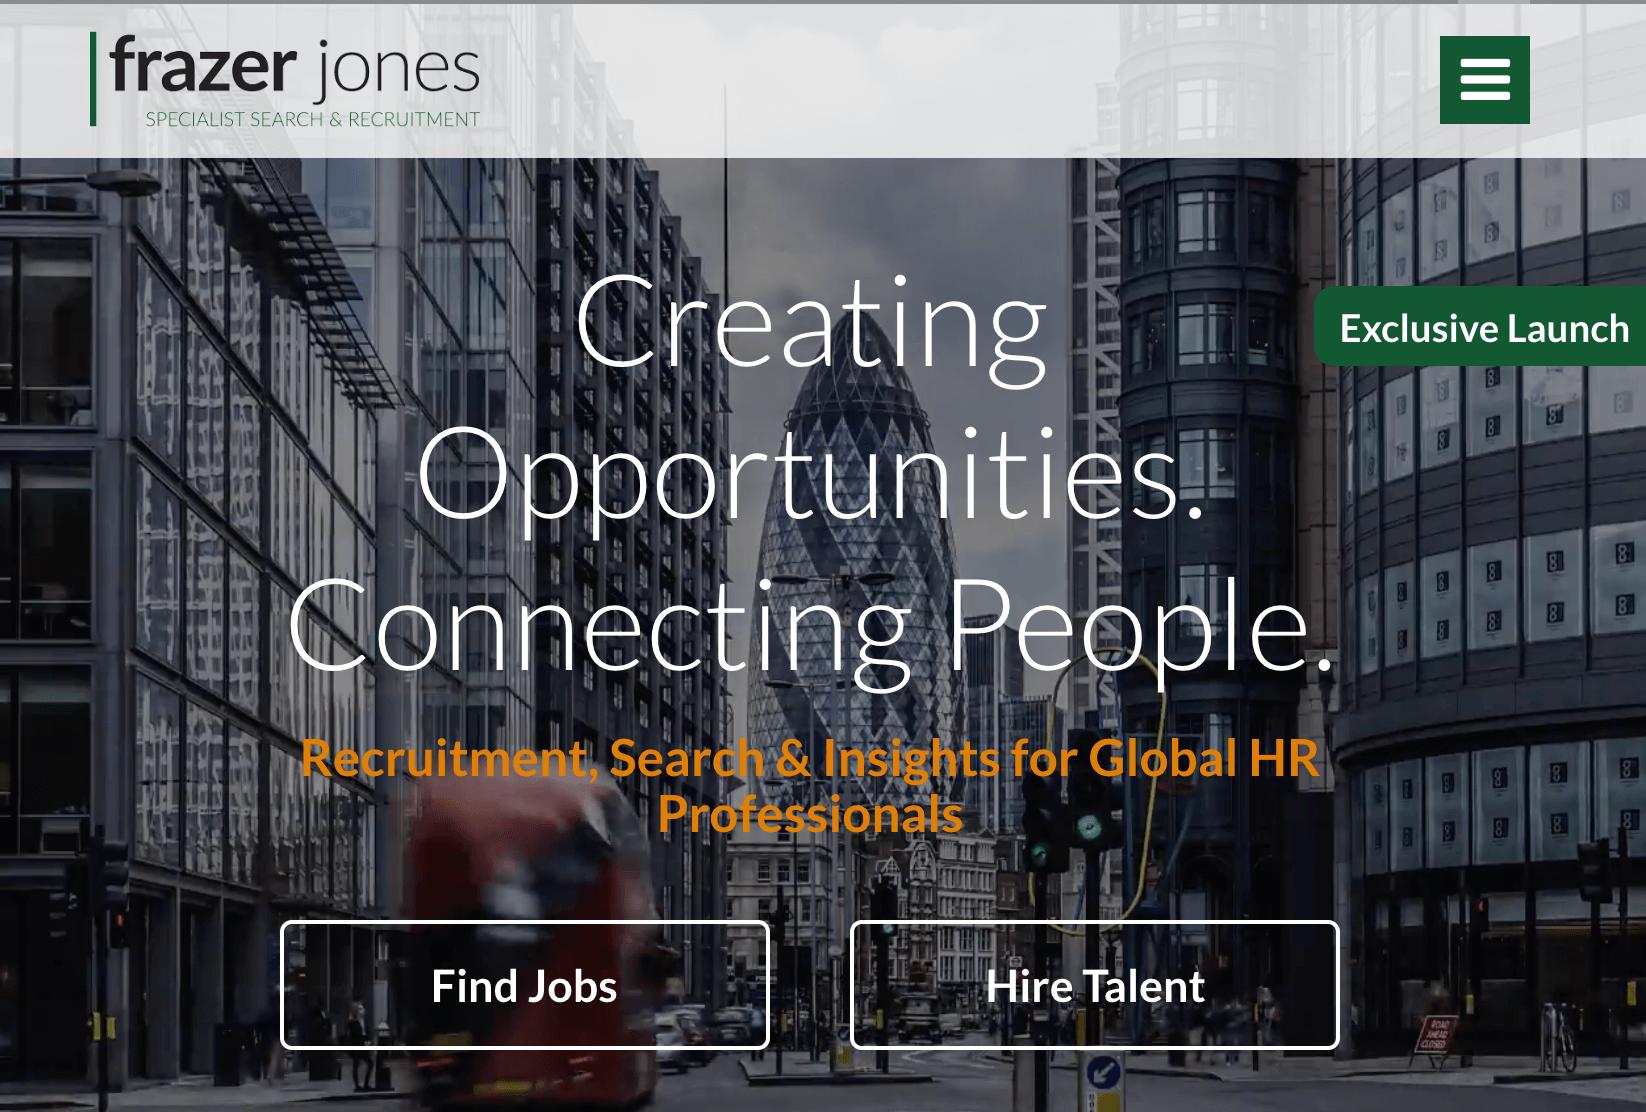 frazer jones job agencies singapore